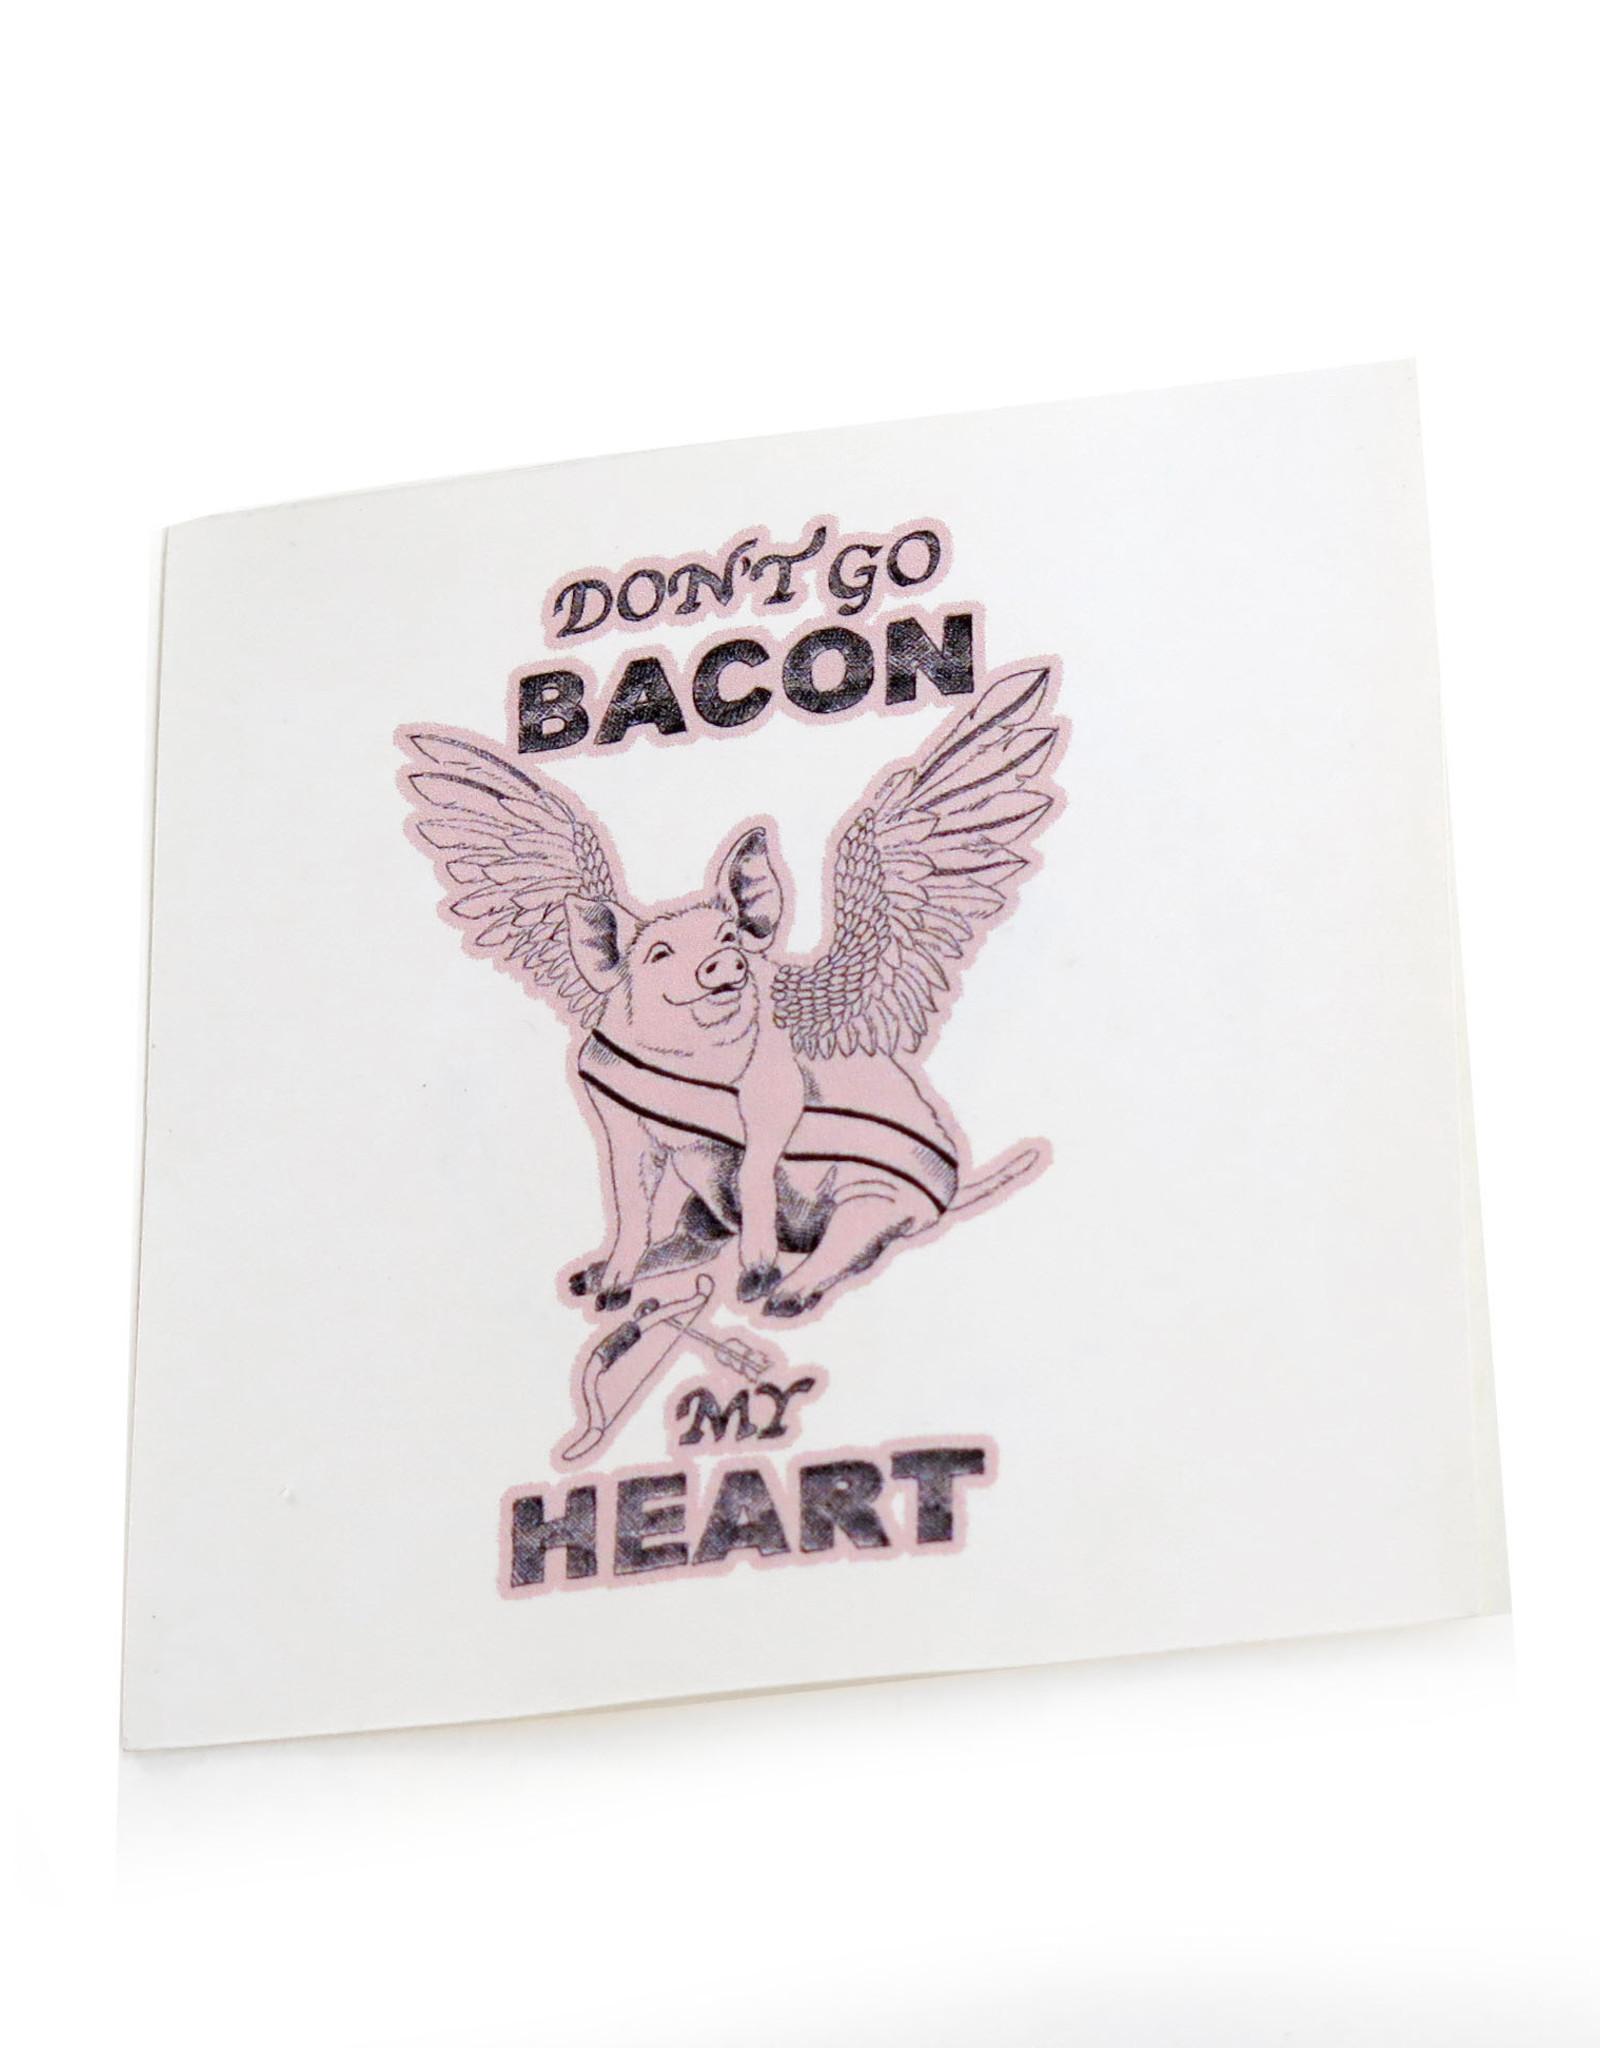 Bacon Sticker by Scott Dickens, All4Pun